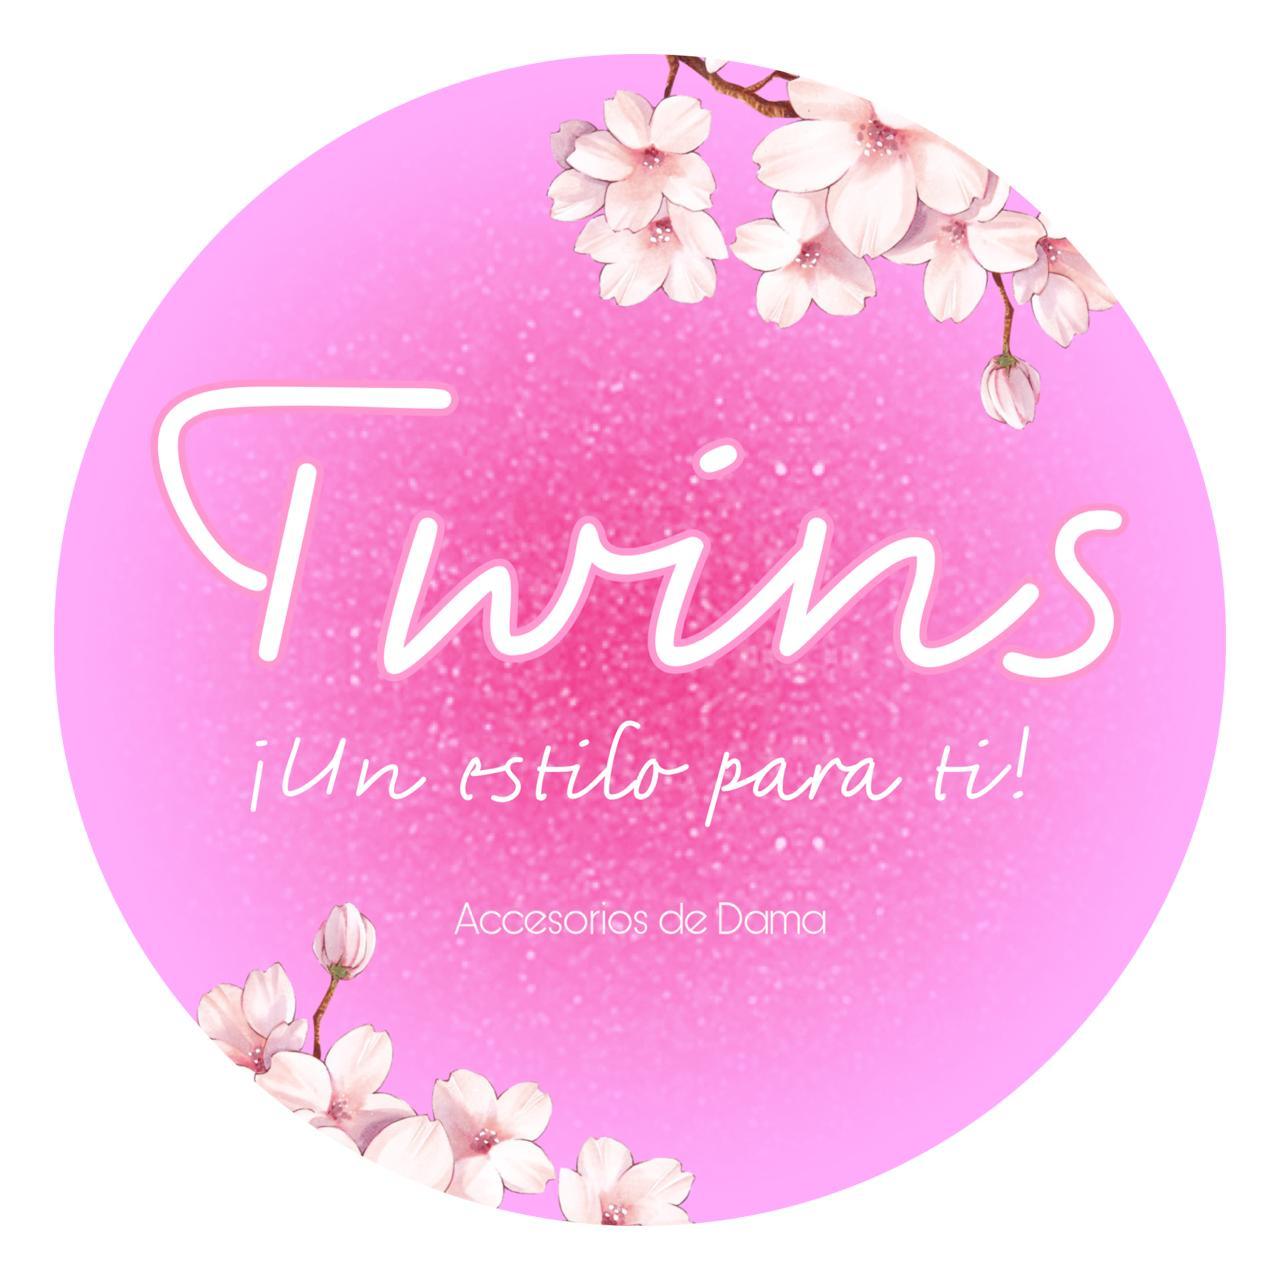 Twins Accesorios